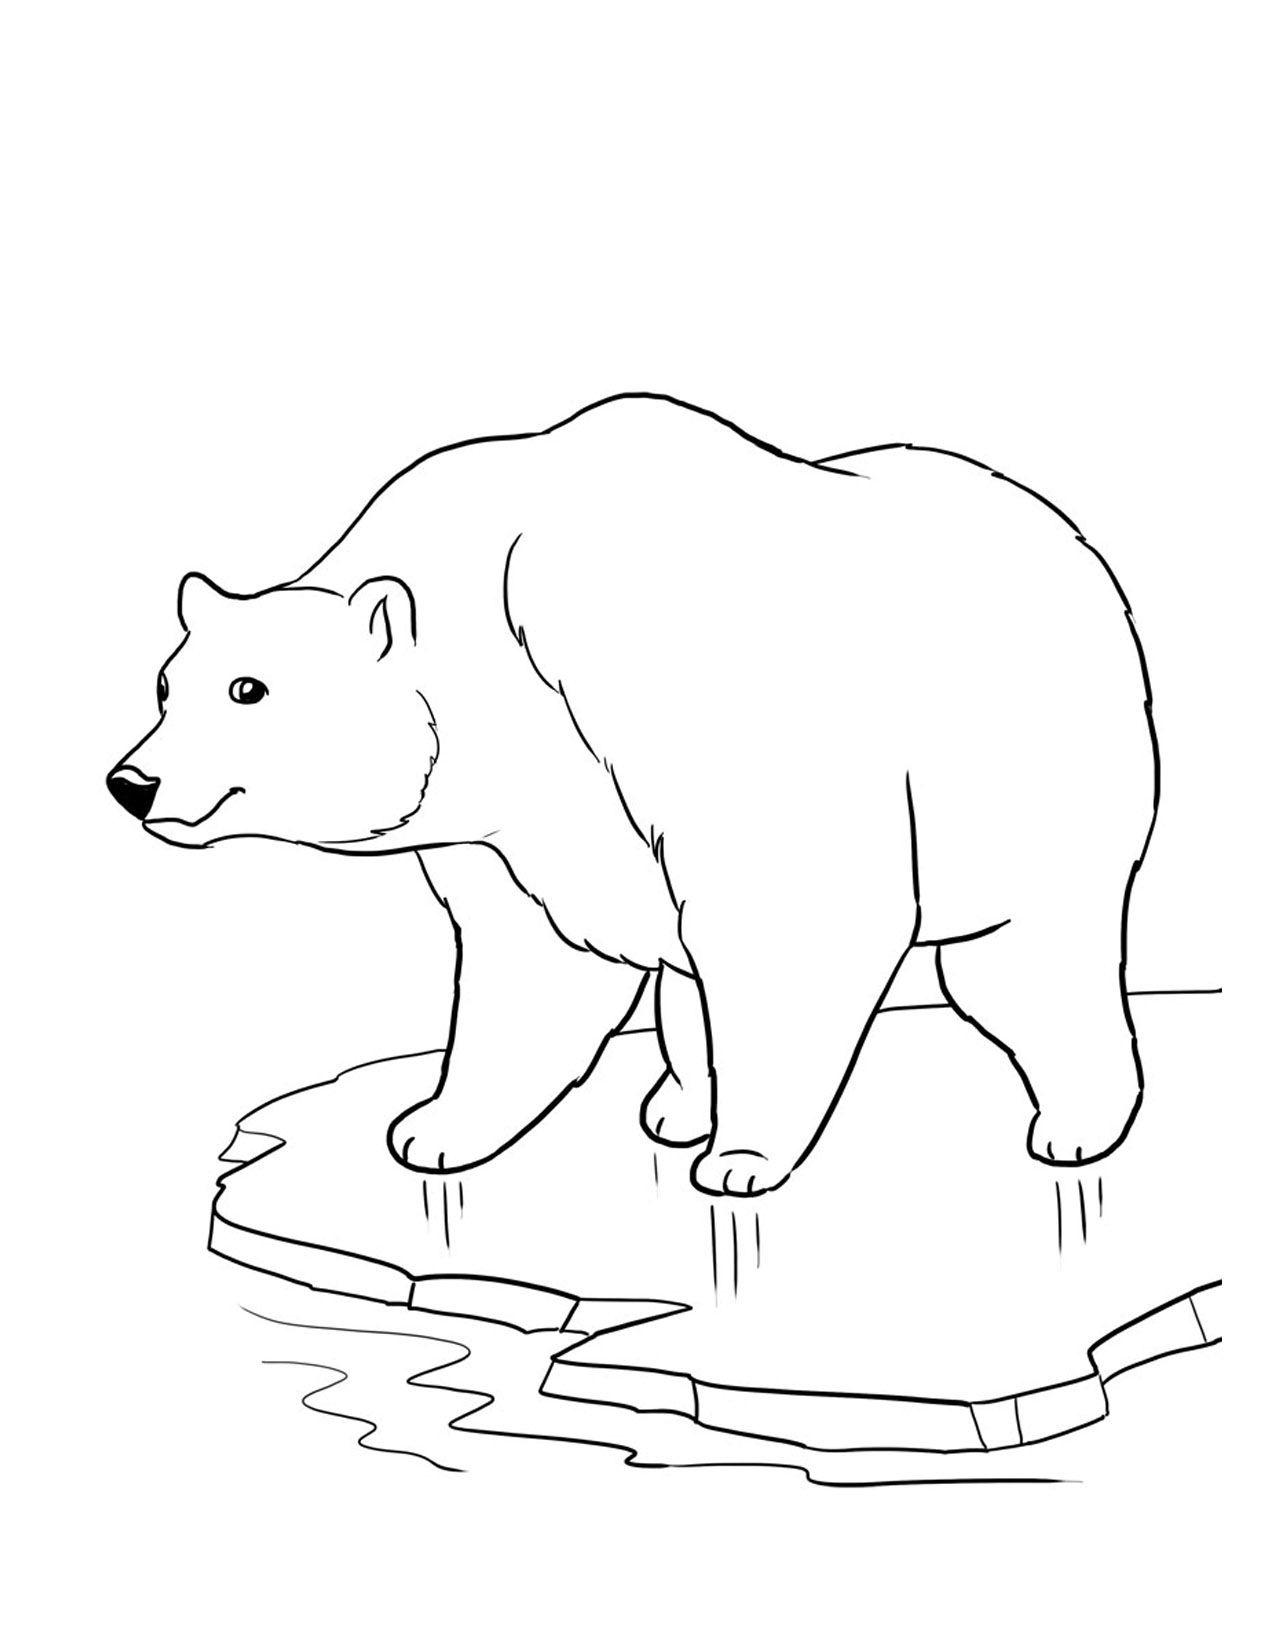 Pinshea Brooking On Polar Bear Moodboard | Bear Coloring Pages - Polar Bear Printable Pictures Free